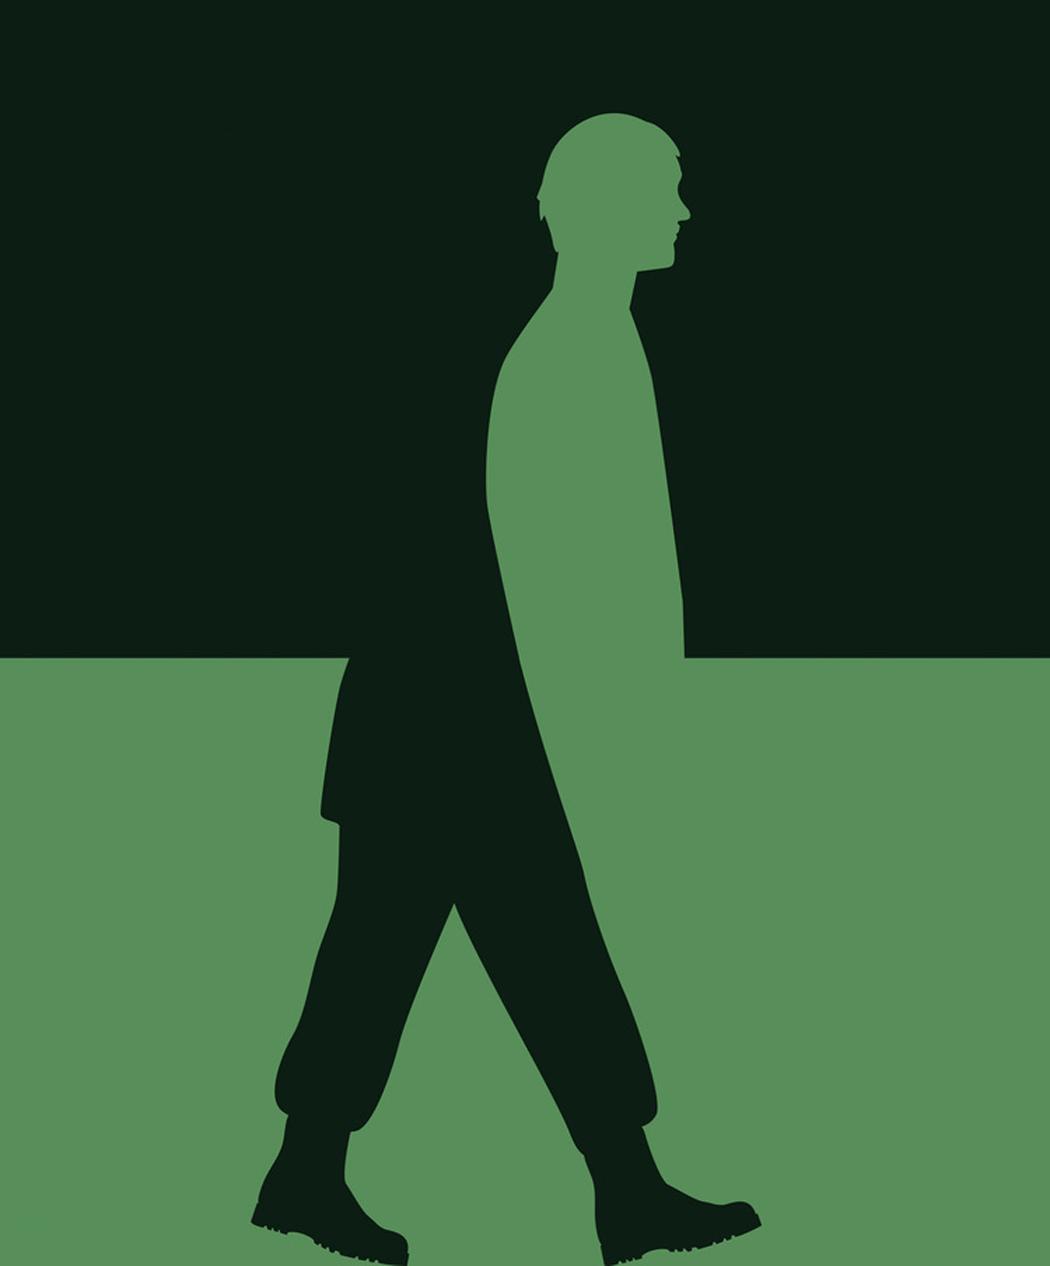 Ironia minimale Ben Wiseman | Collater.al 1